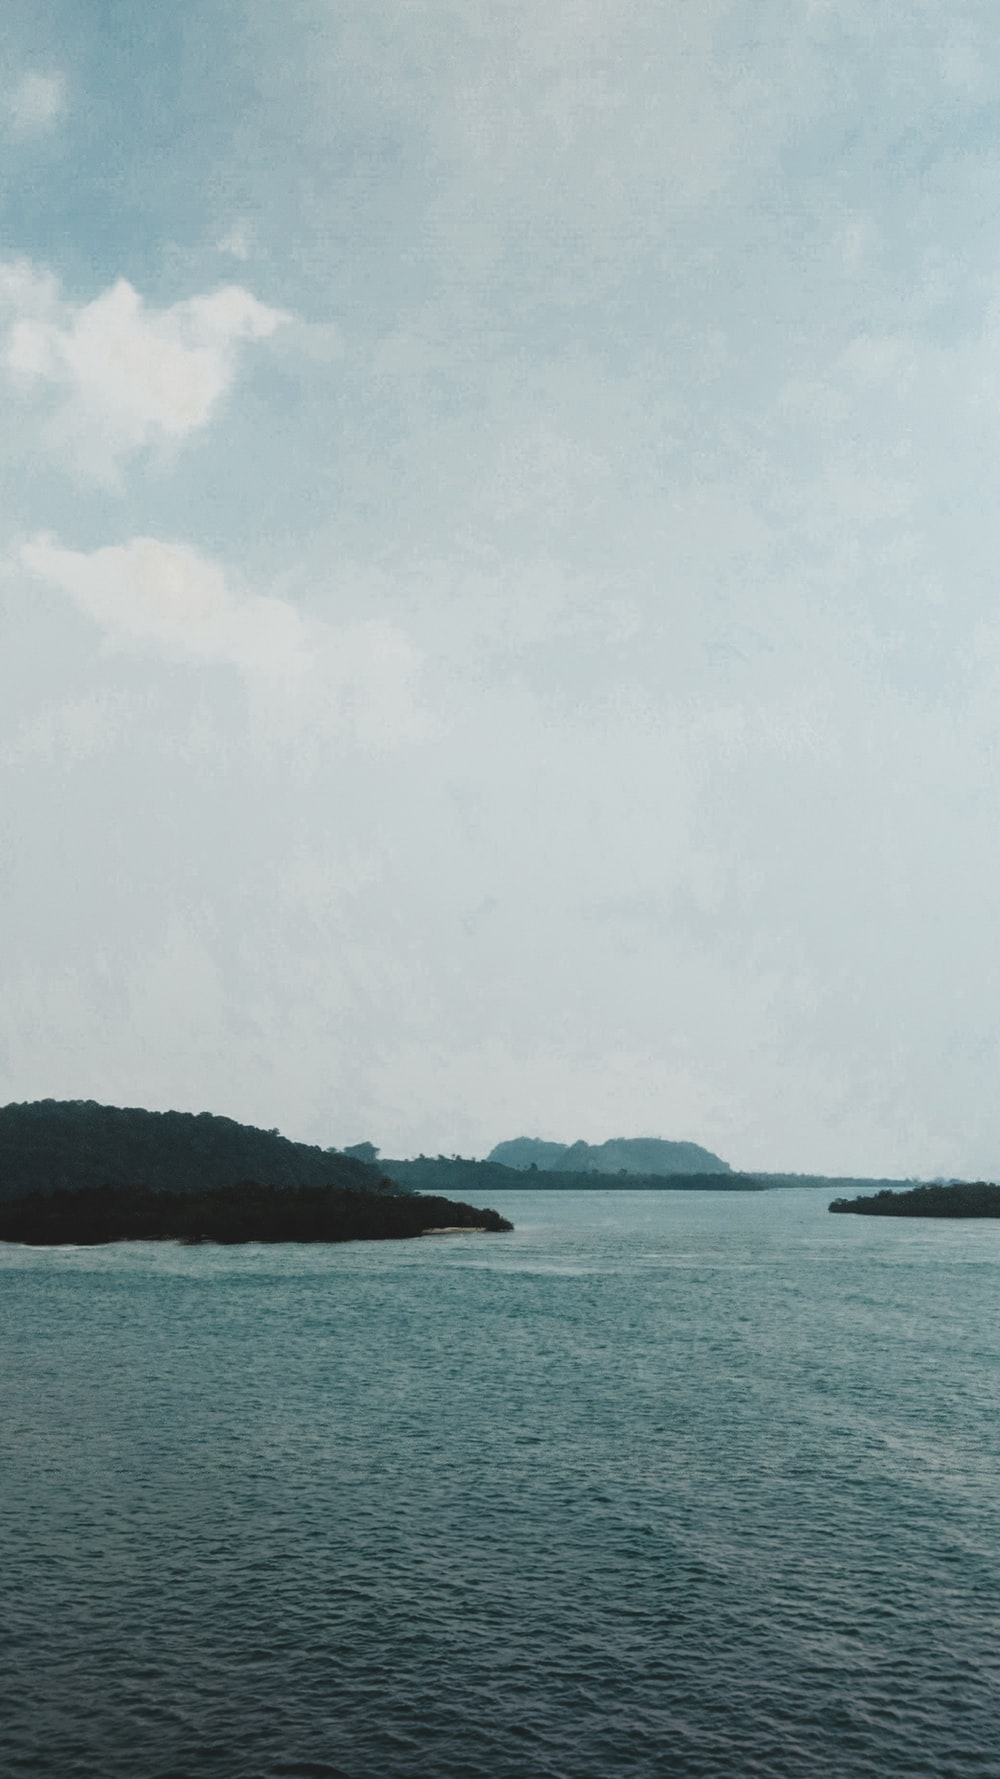 body of water near isle